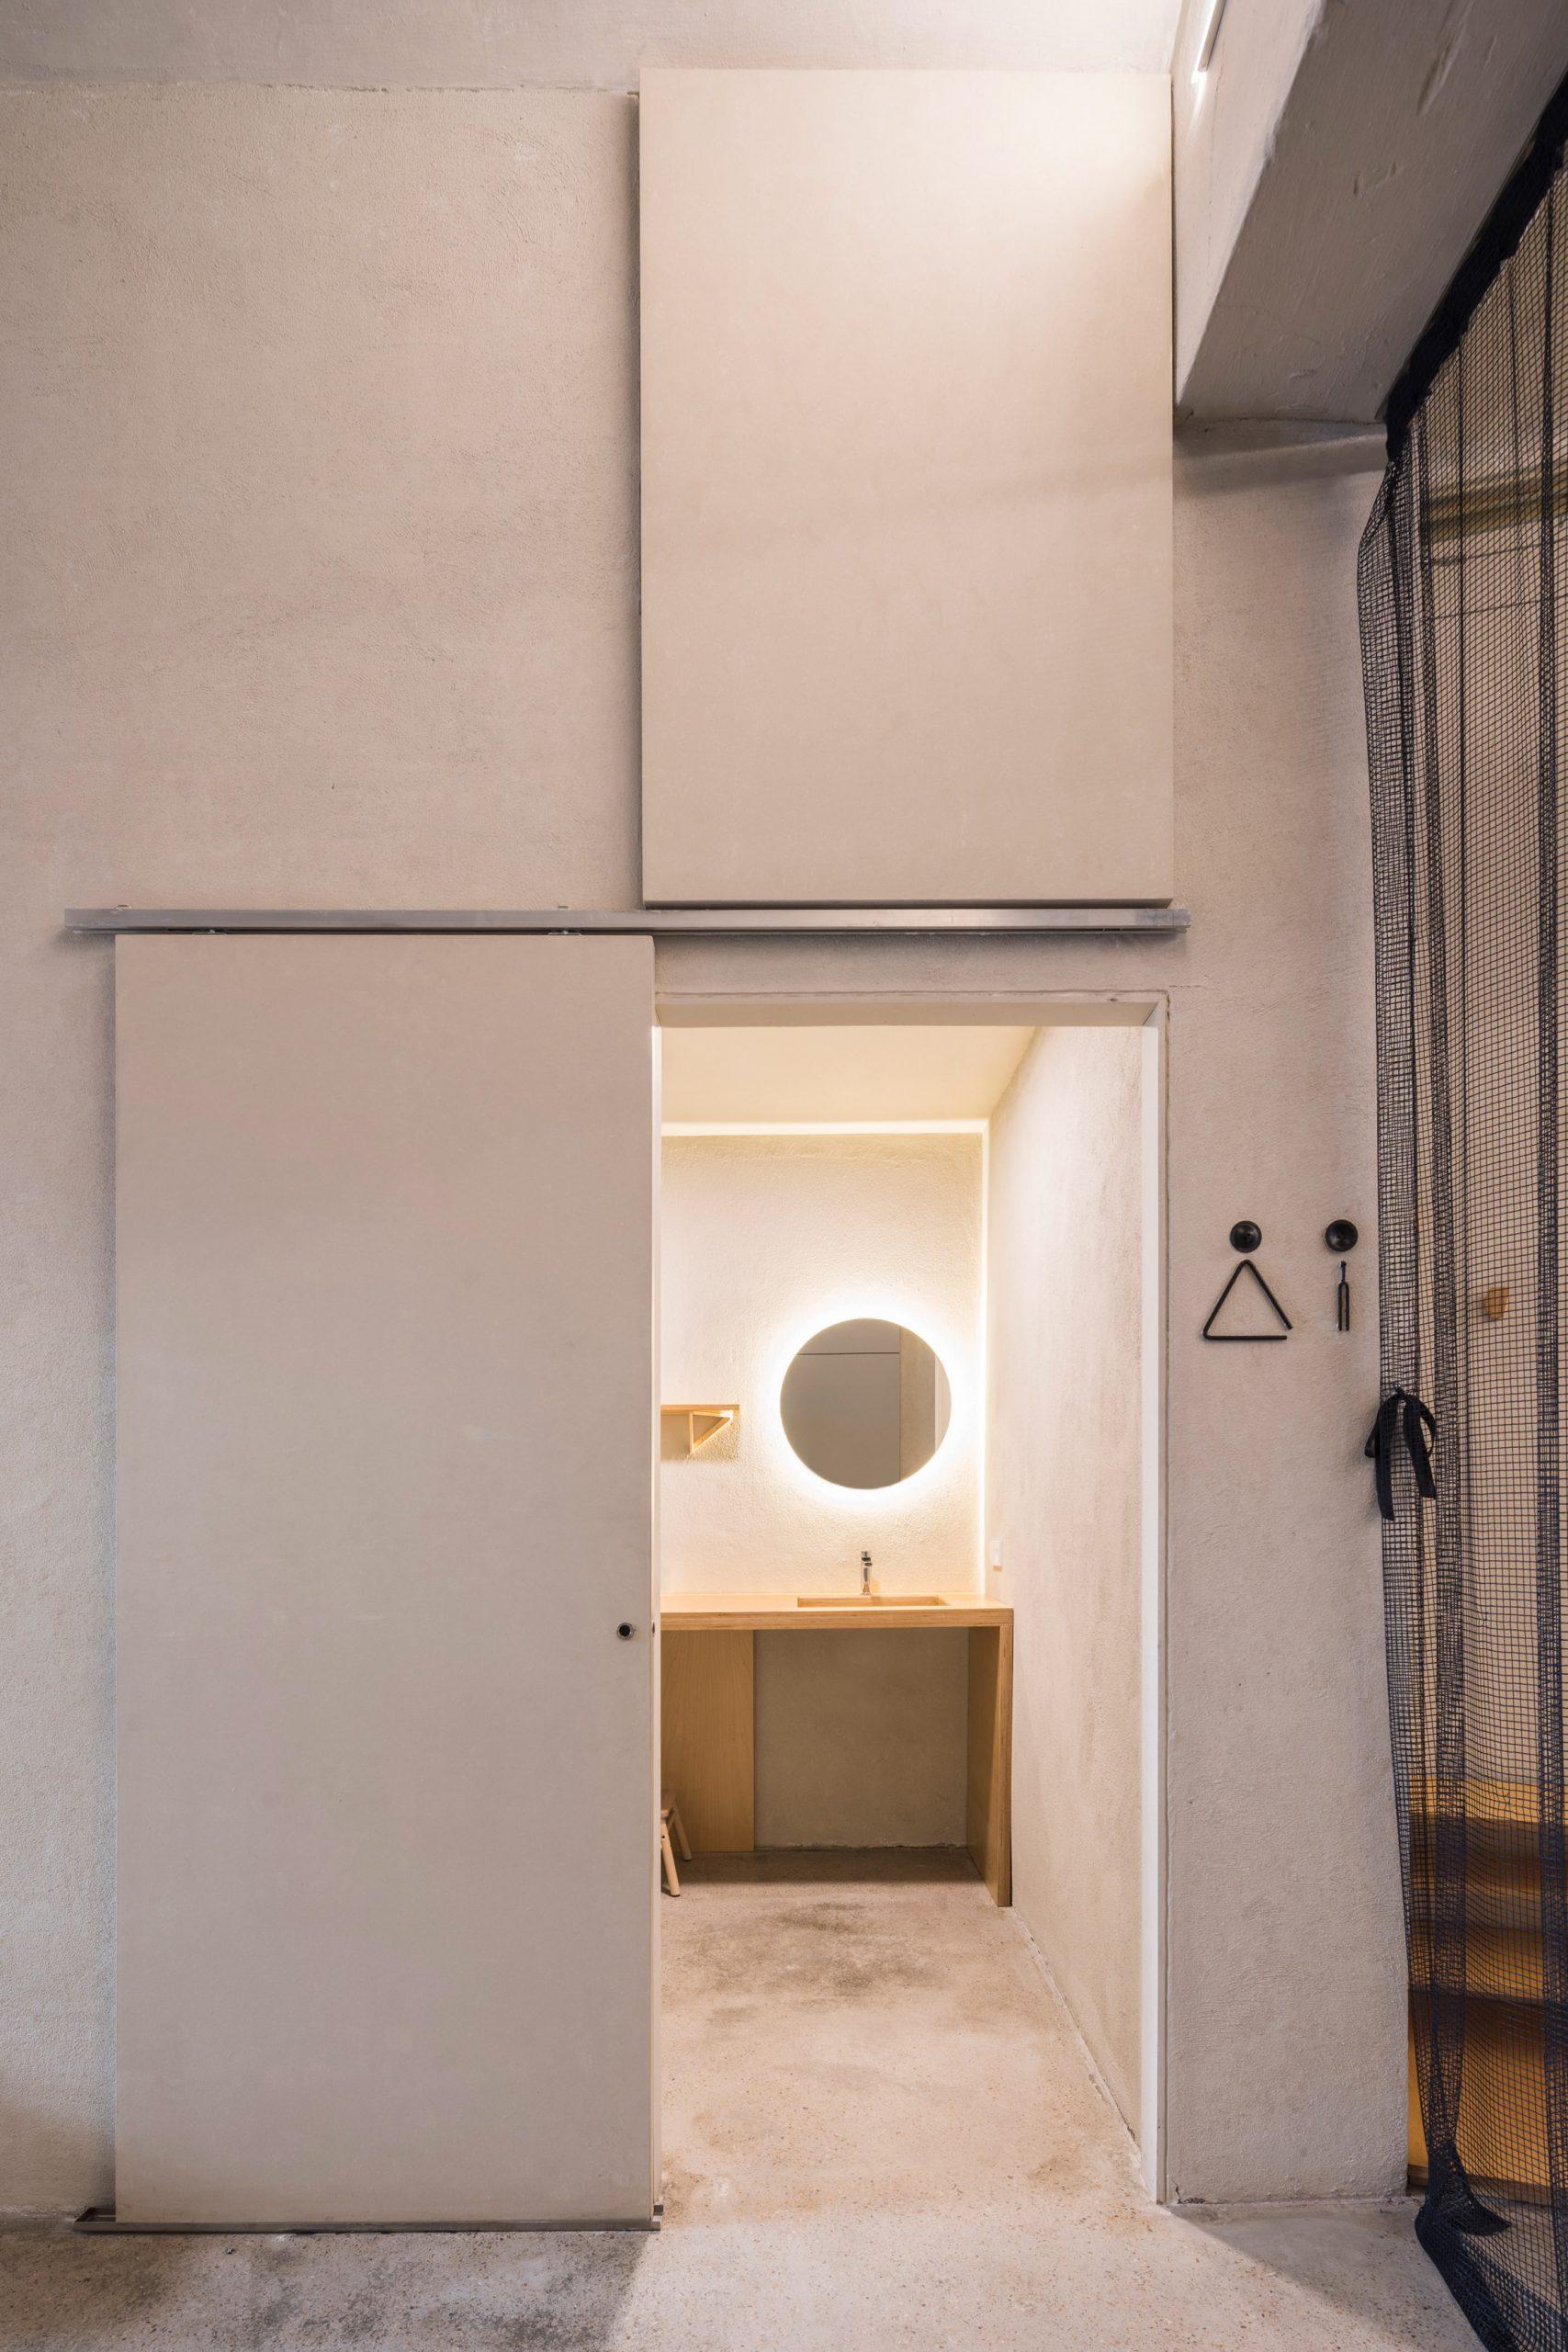 Entrance to the toilets at the Yoglar Music School